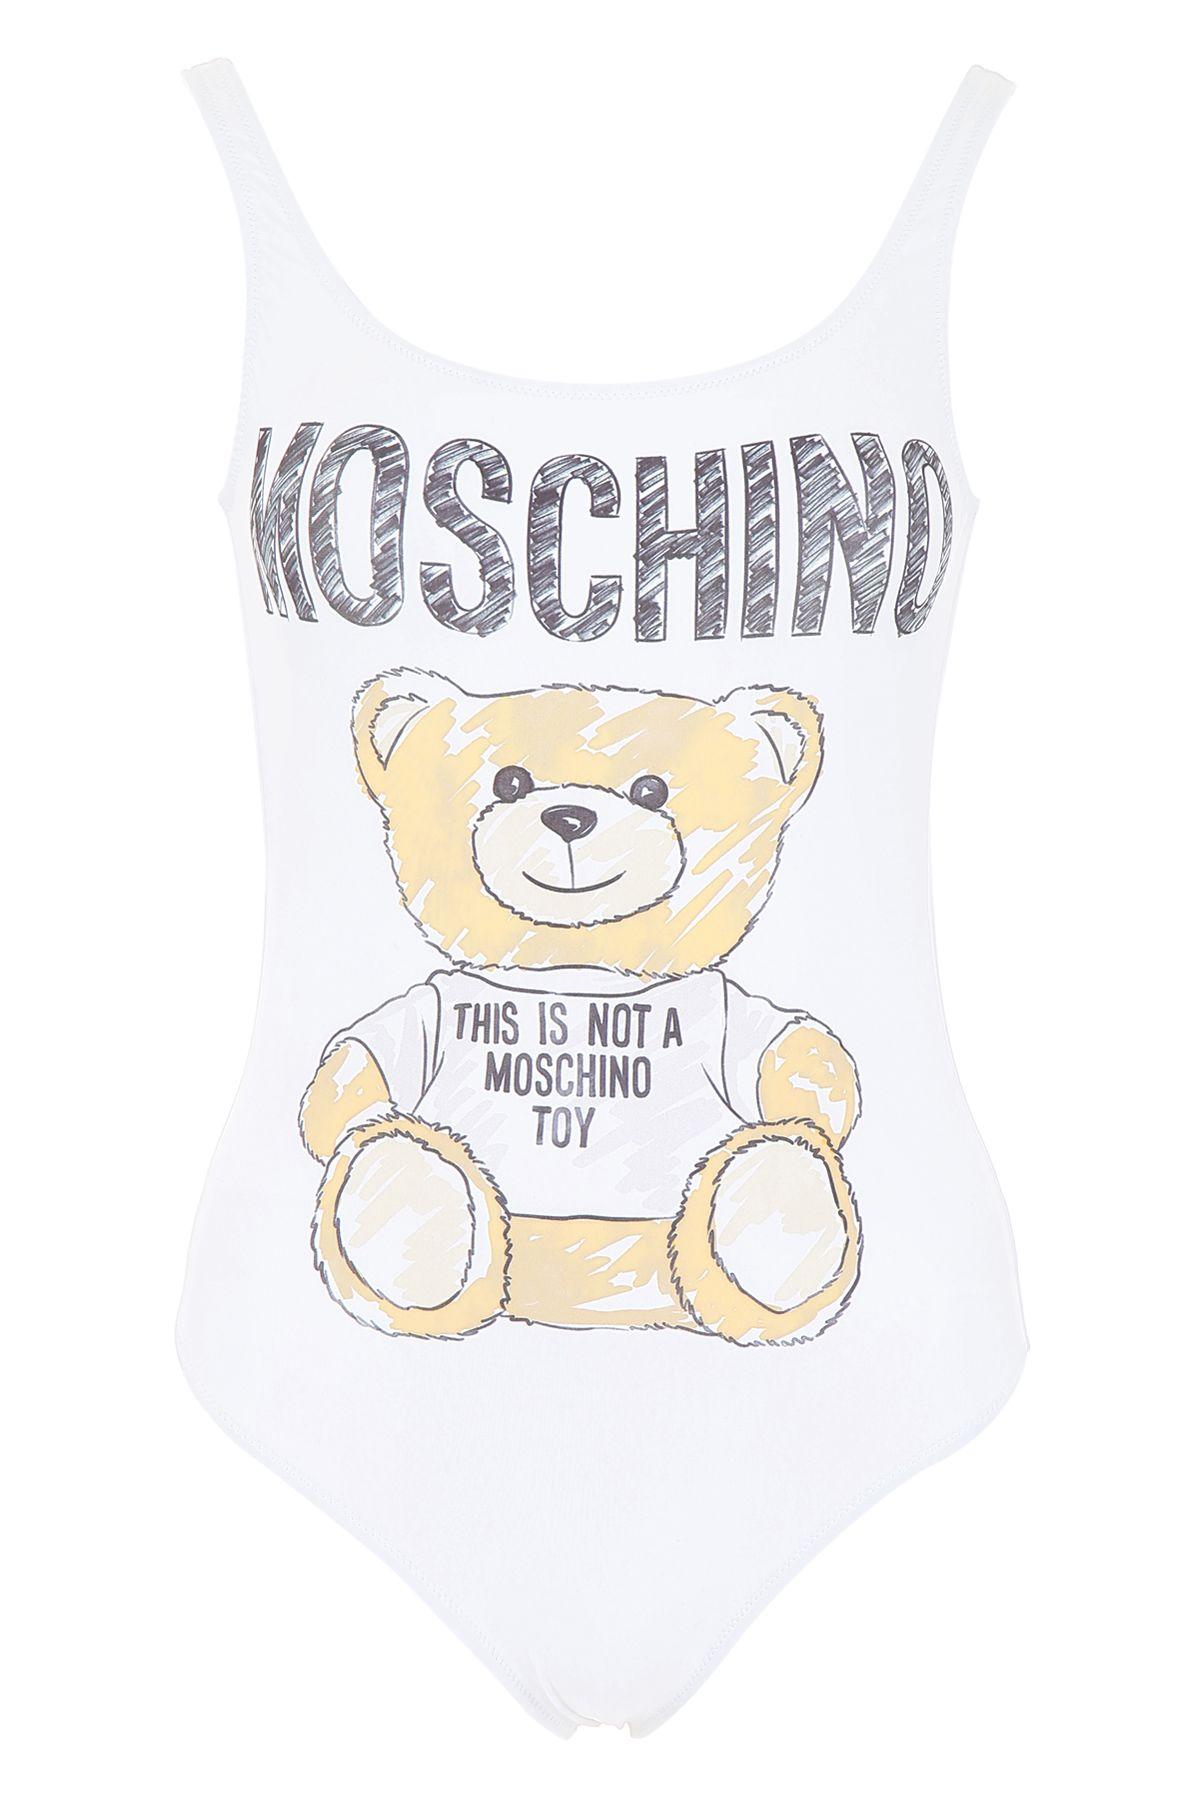 024a886486055 Moschino Moschino Teddy Bear Swimsuit - WHITE (White) - 10929395 ...